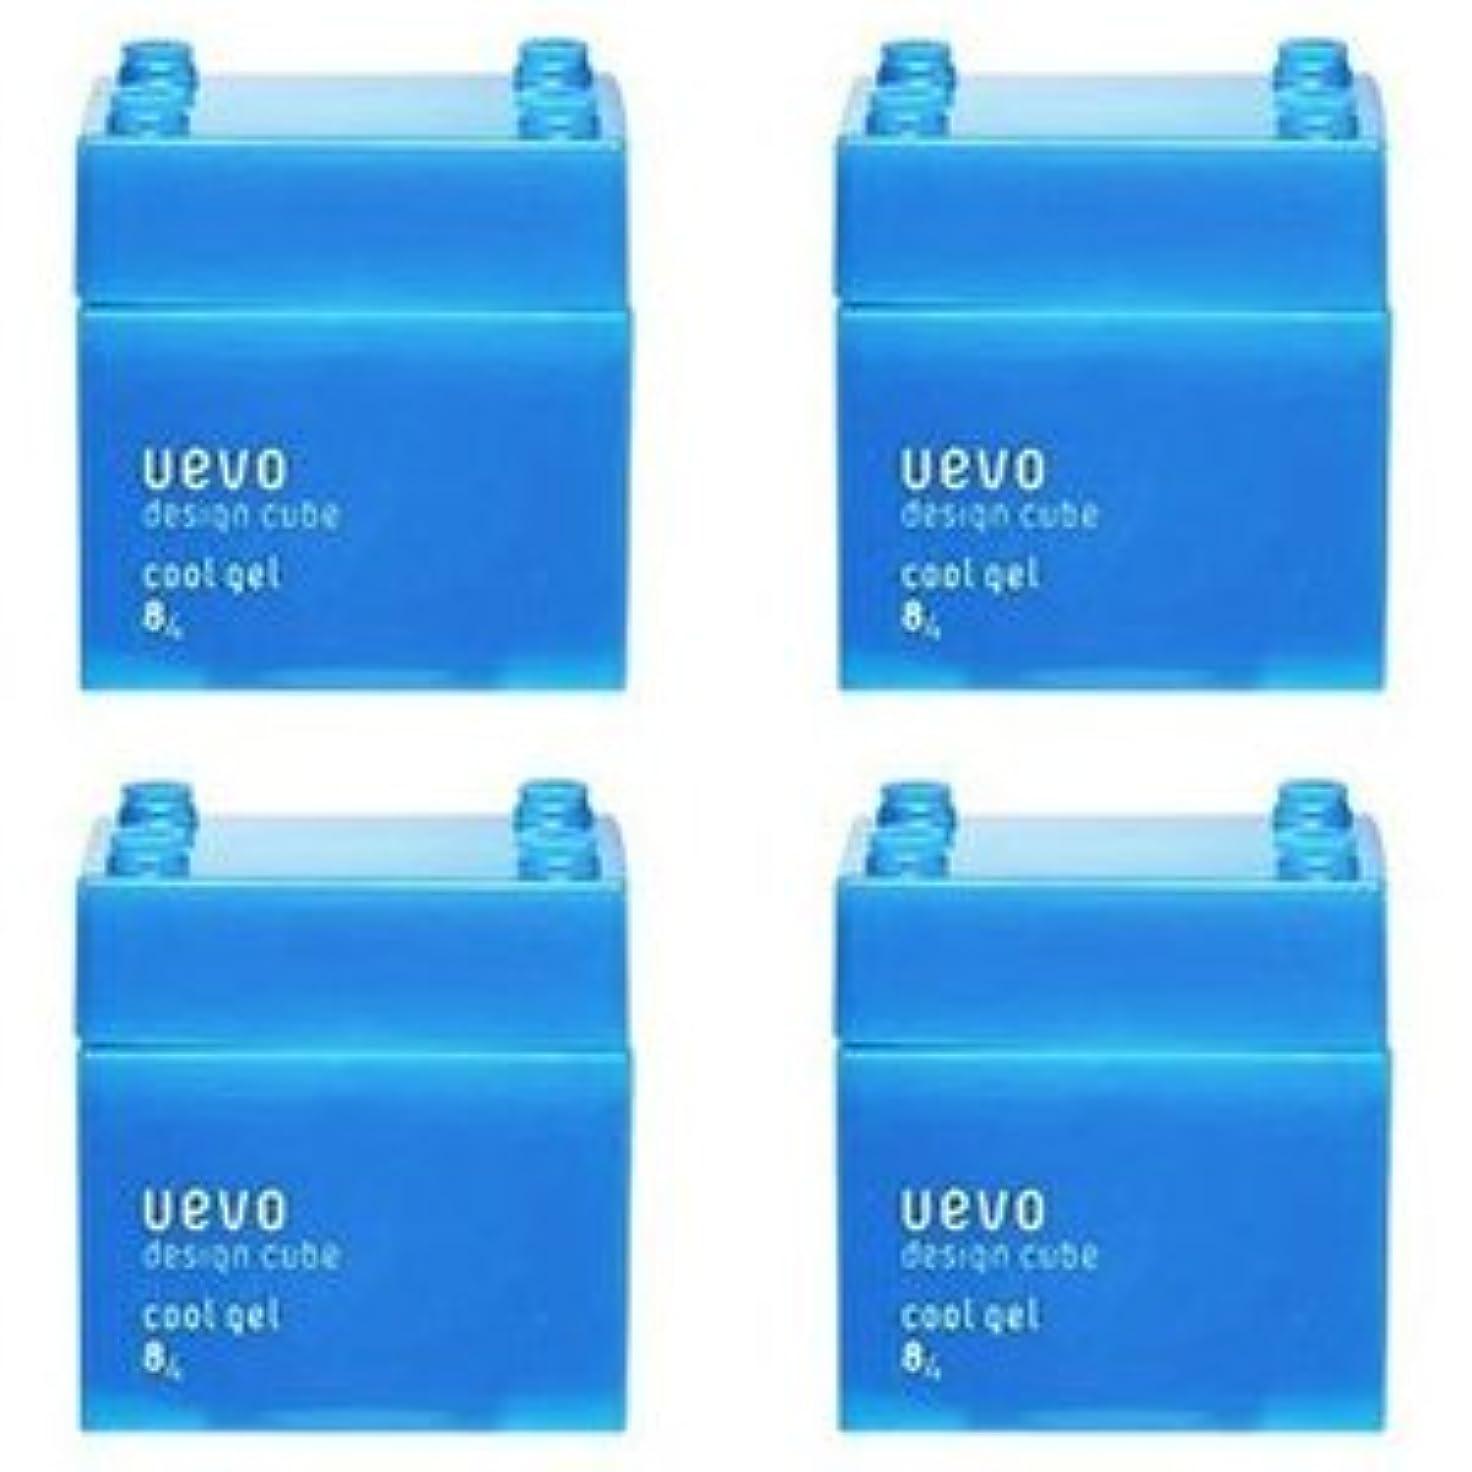 【X4個セット】 デミ ウェーボ デザインキューブ クールジェル 80g cool gel DEMI uevo design cube